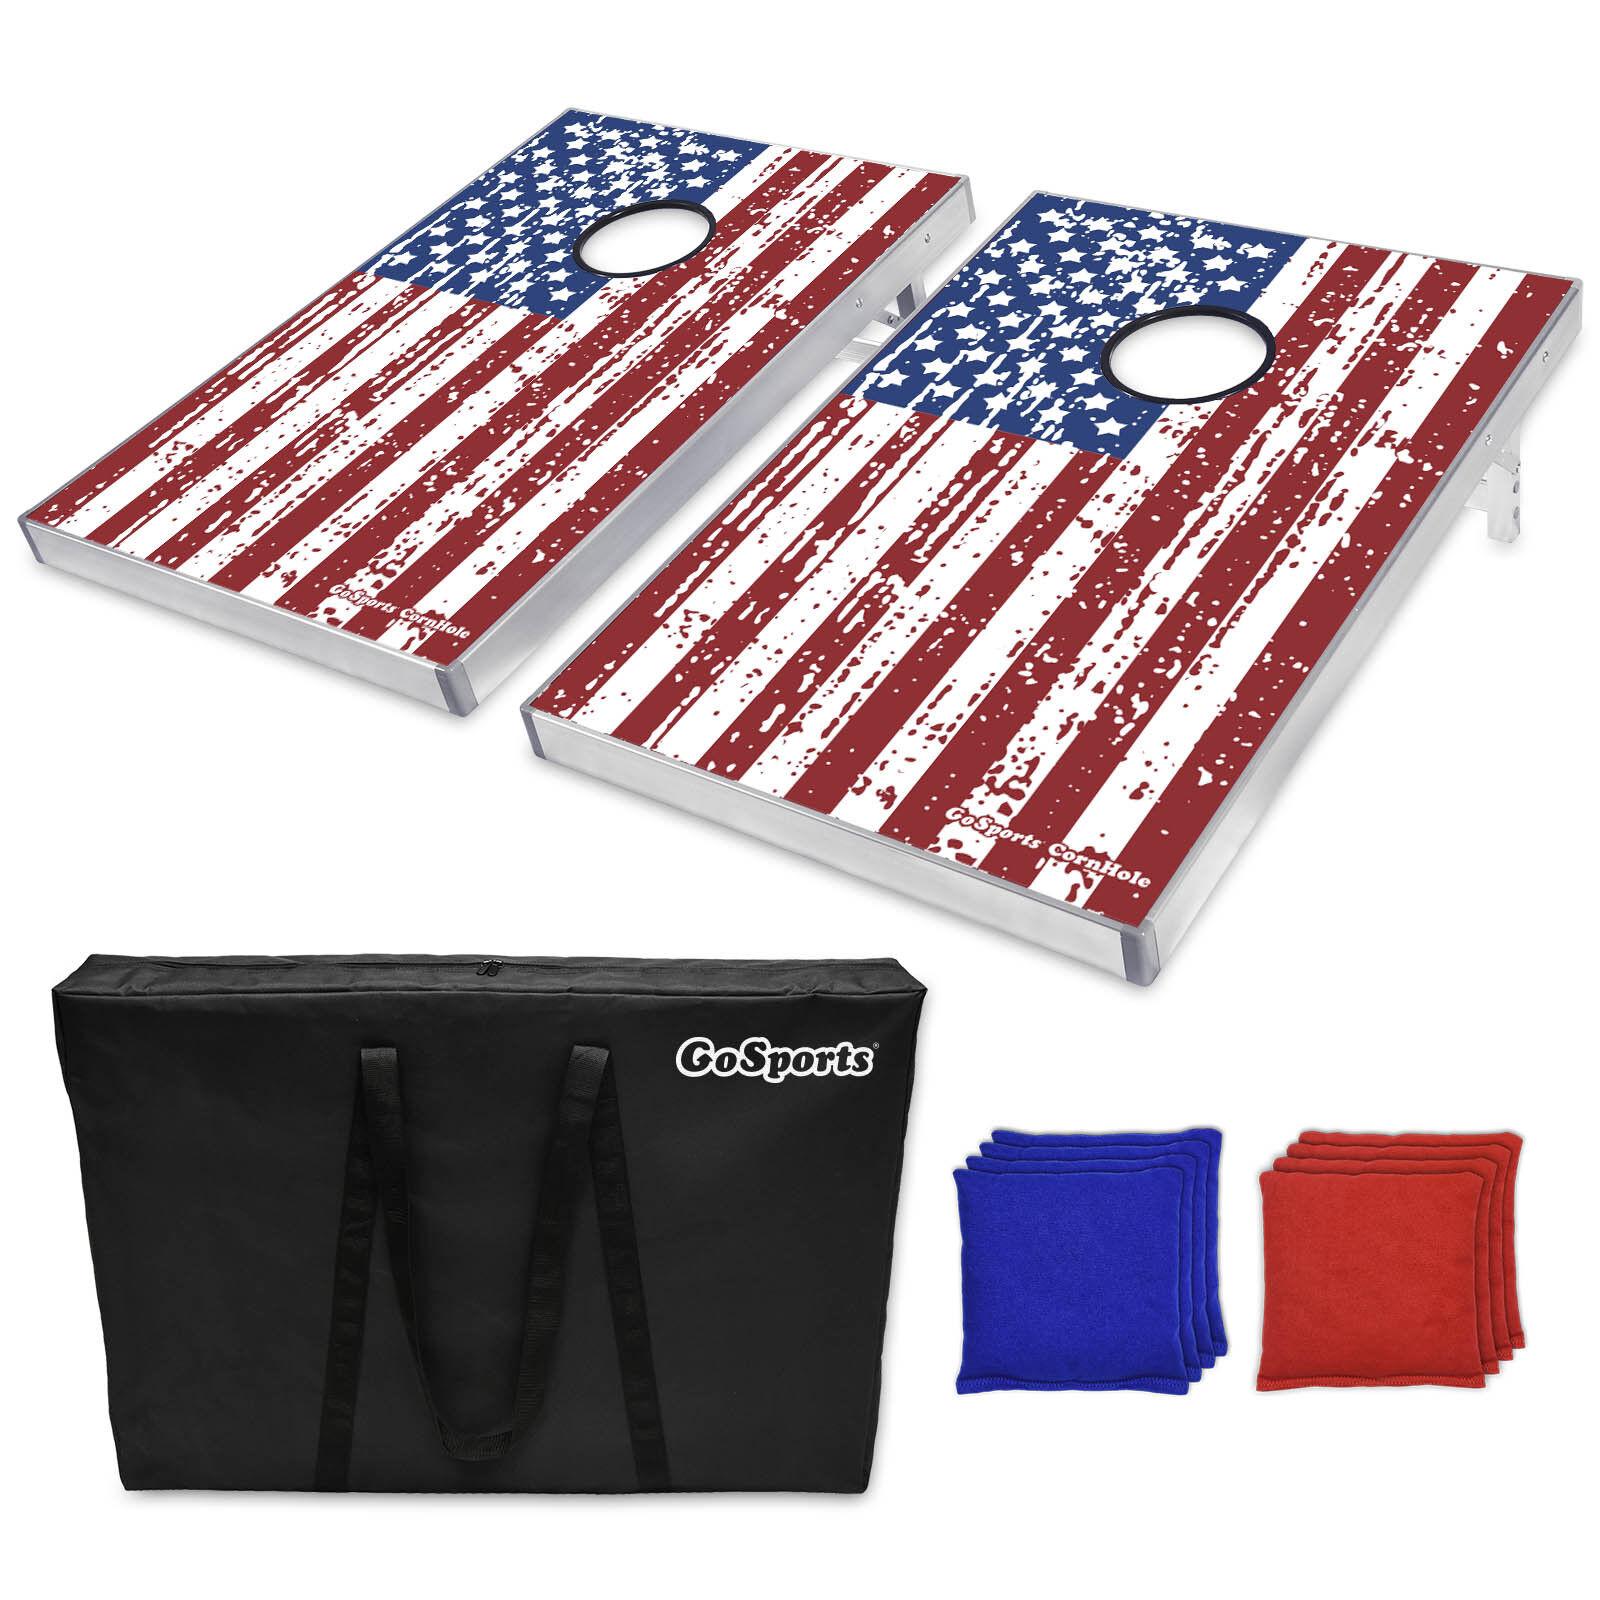 American Flag Bean Bag Tailgate Cornhole Game - Ultra Portable - Strong Aluminum